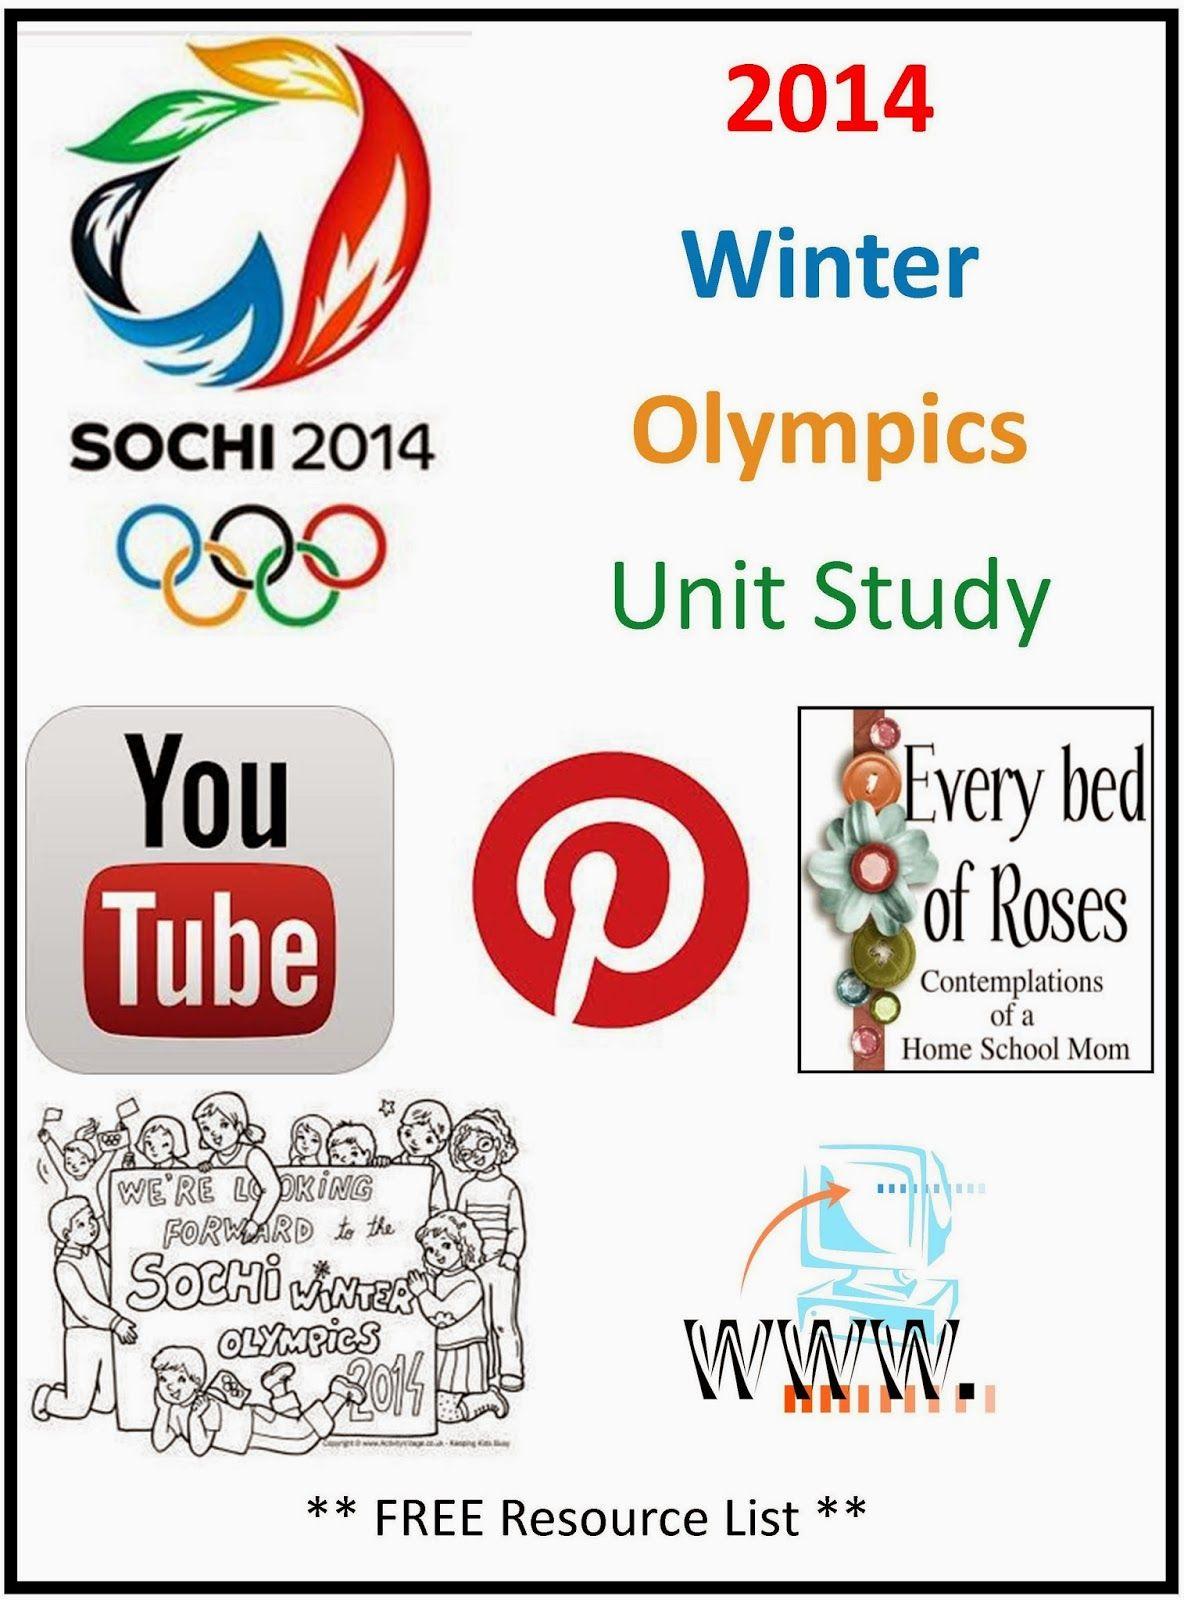 Winter Olympics Unit Study Resources